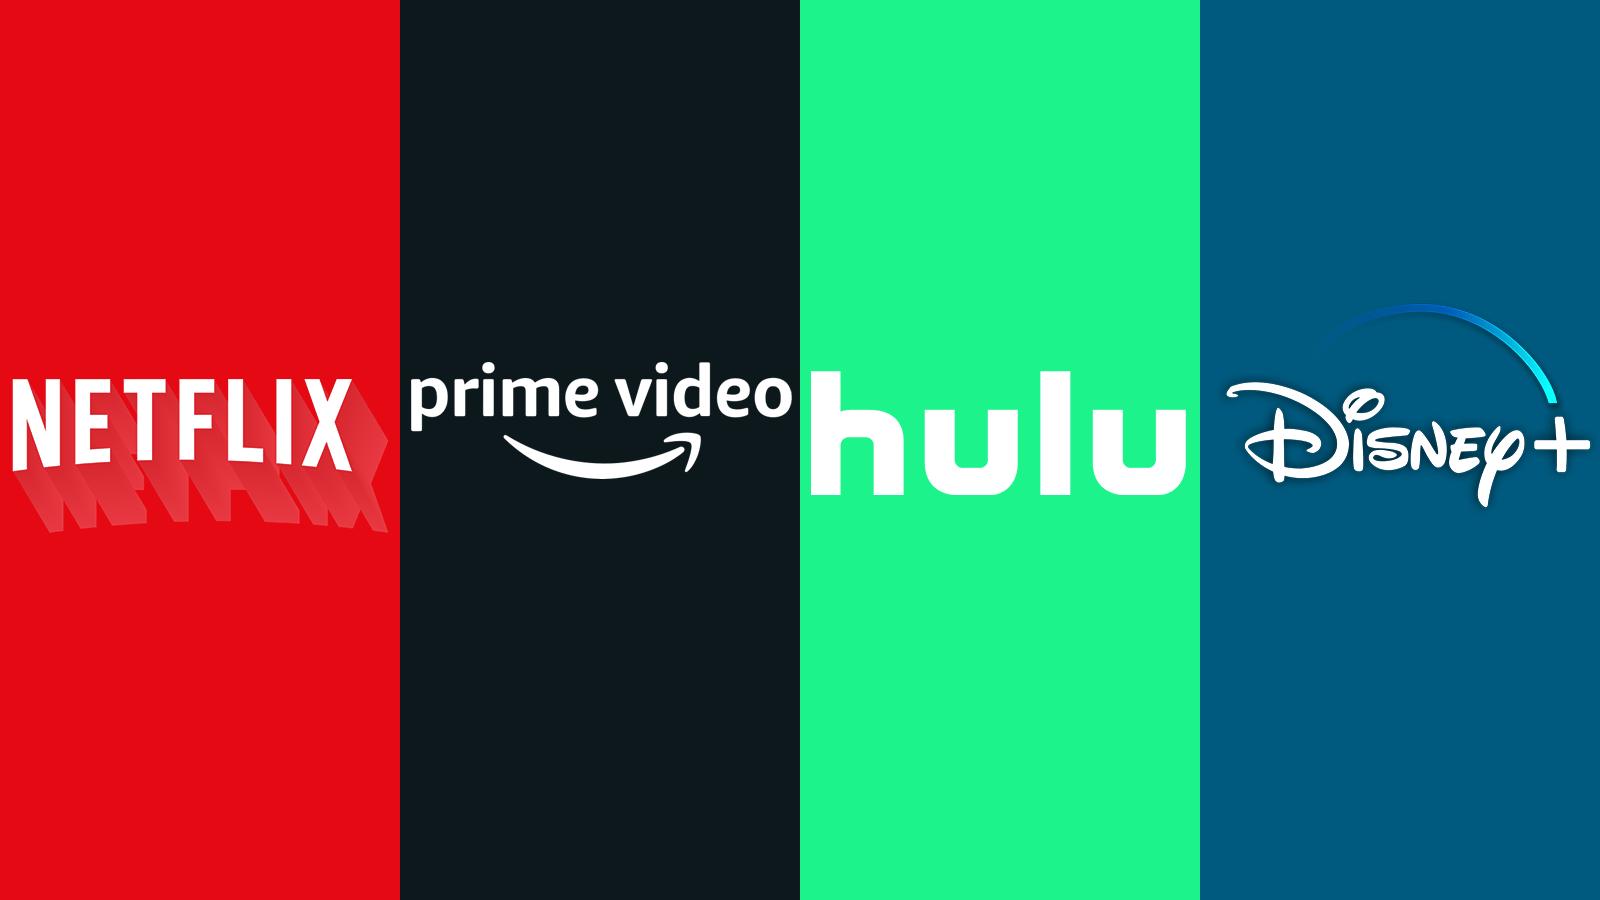 Streaming Wars: Netflix, Prime Video, Hulu, and Disney+ | by UCLA DataRes |  Medium